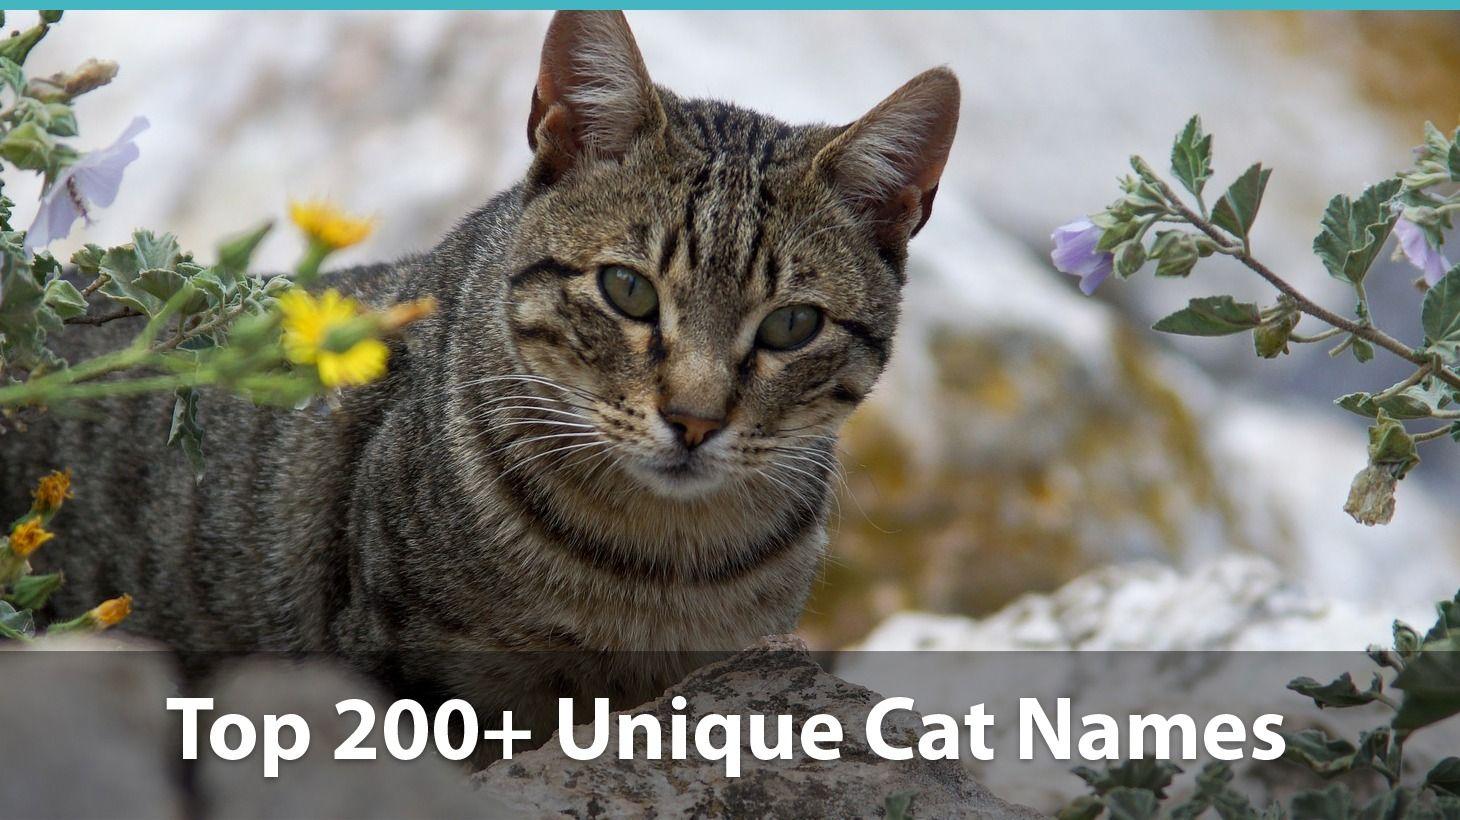 Top 200+ Unique Cat Names Puns, Funny Options, And More